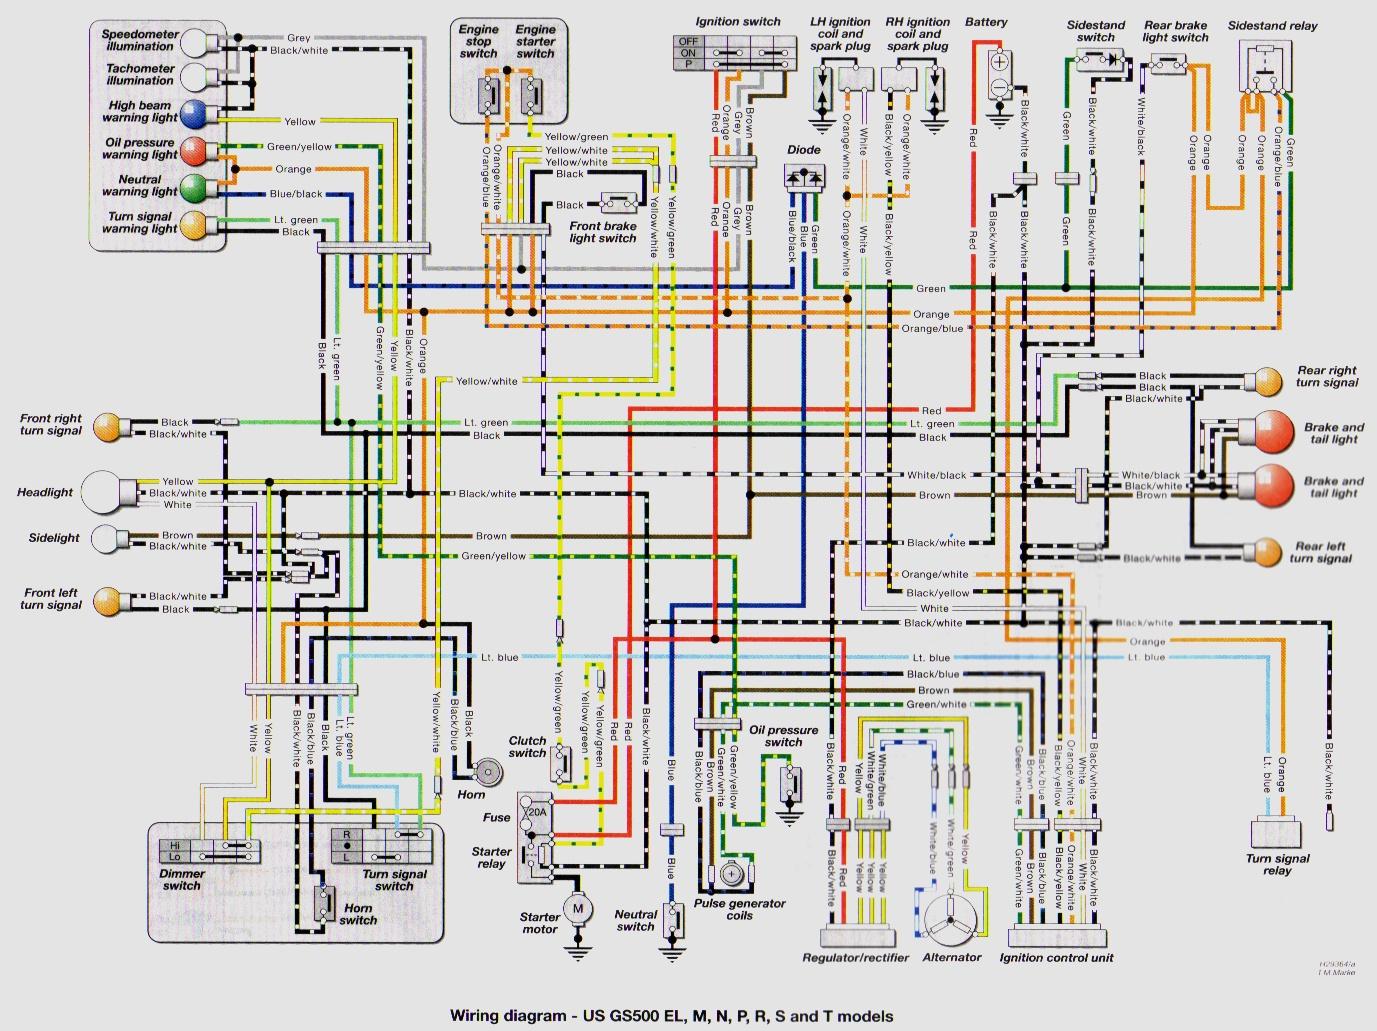 hight resolution of gs500 wiring diagram owner manual and wiring diagram books u2022 rh solarrius com suzuki gs 500